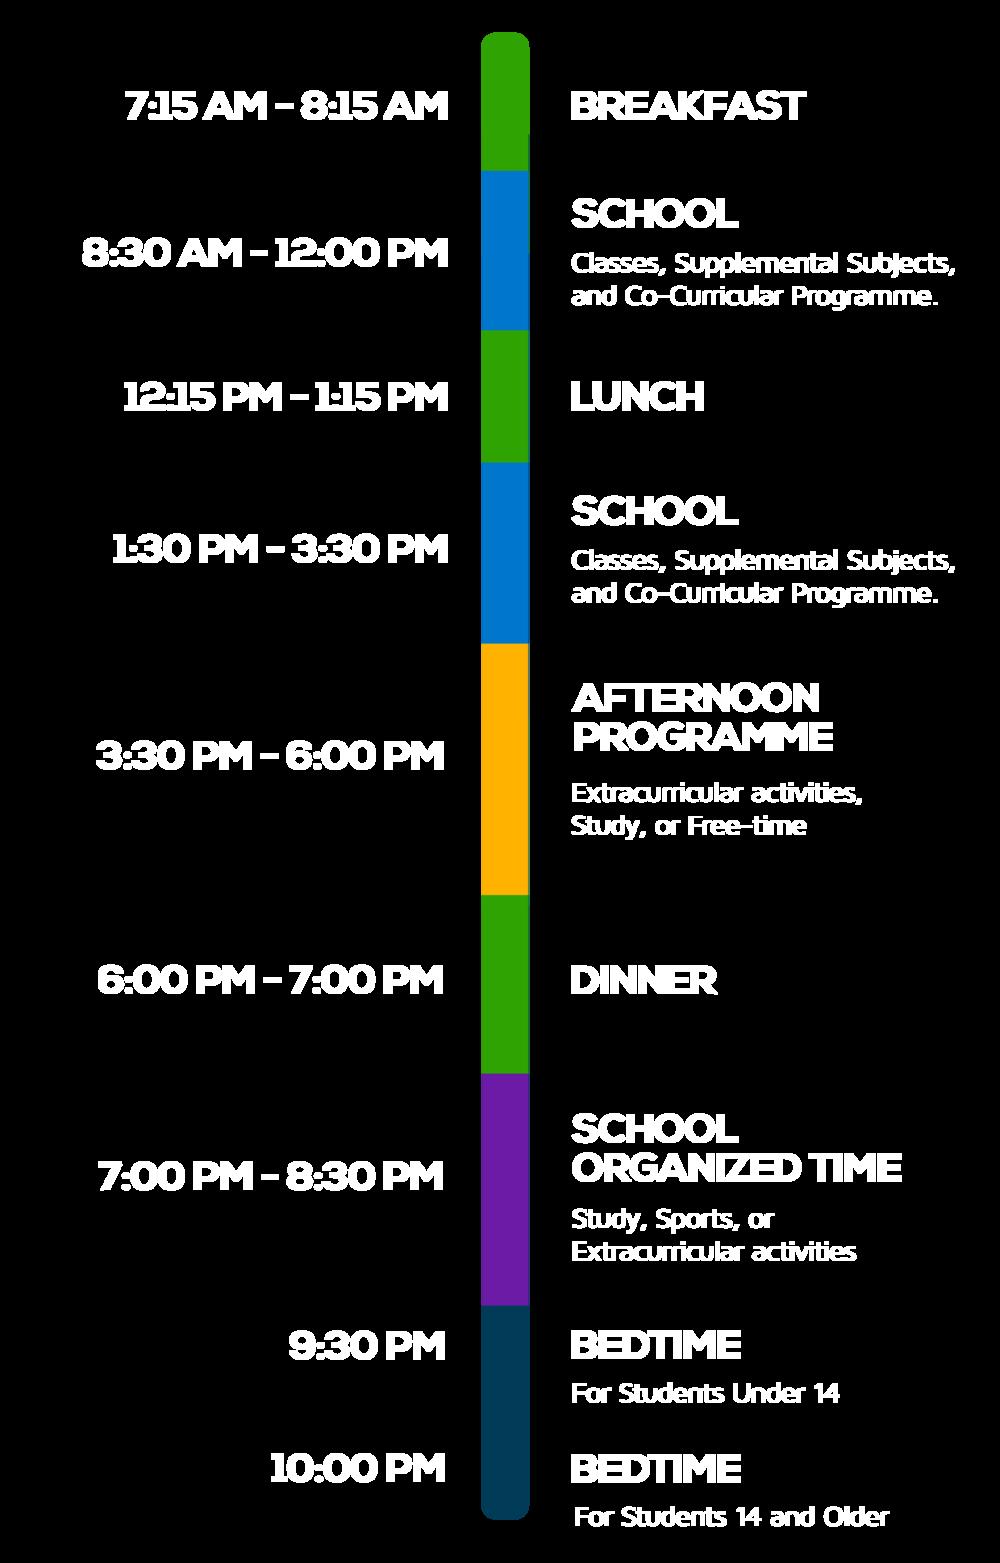 Unisus-International-School-Daily-Schedule-Updated.png